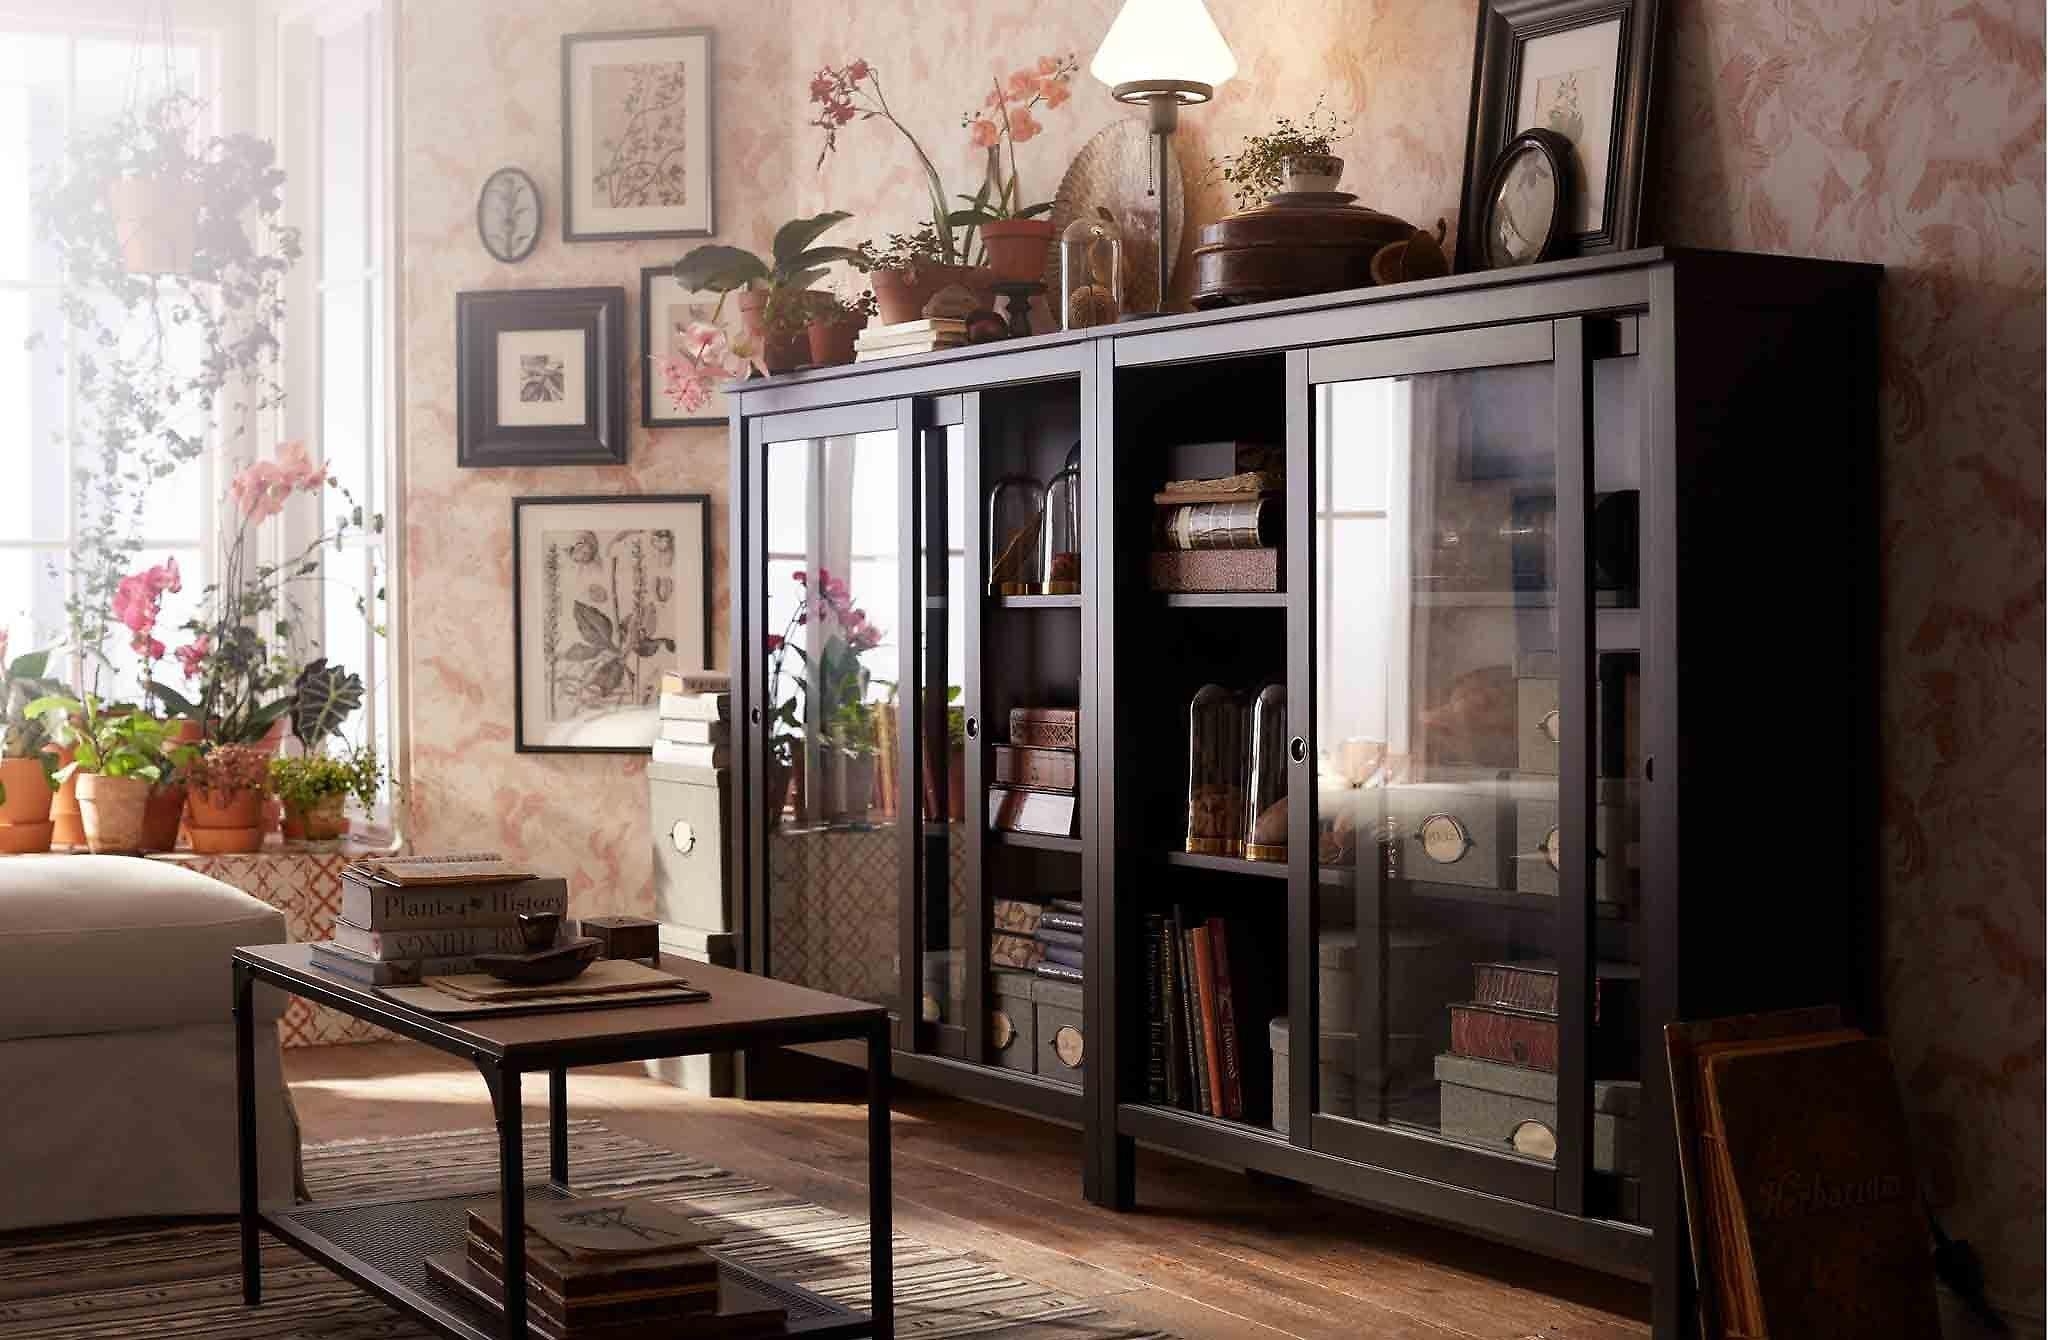 Design Collection Marvellous Ikea Hemnes Living Room 49 New Inspiration